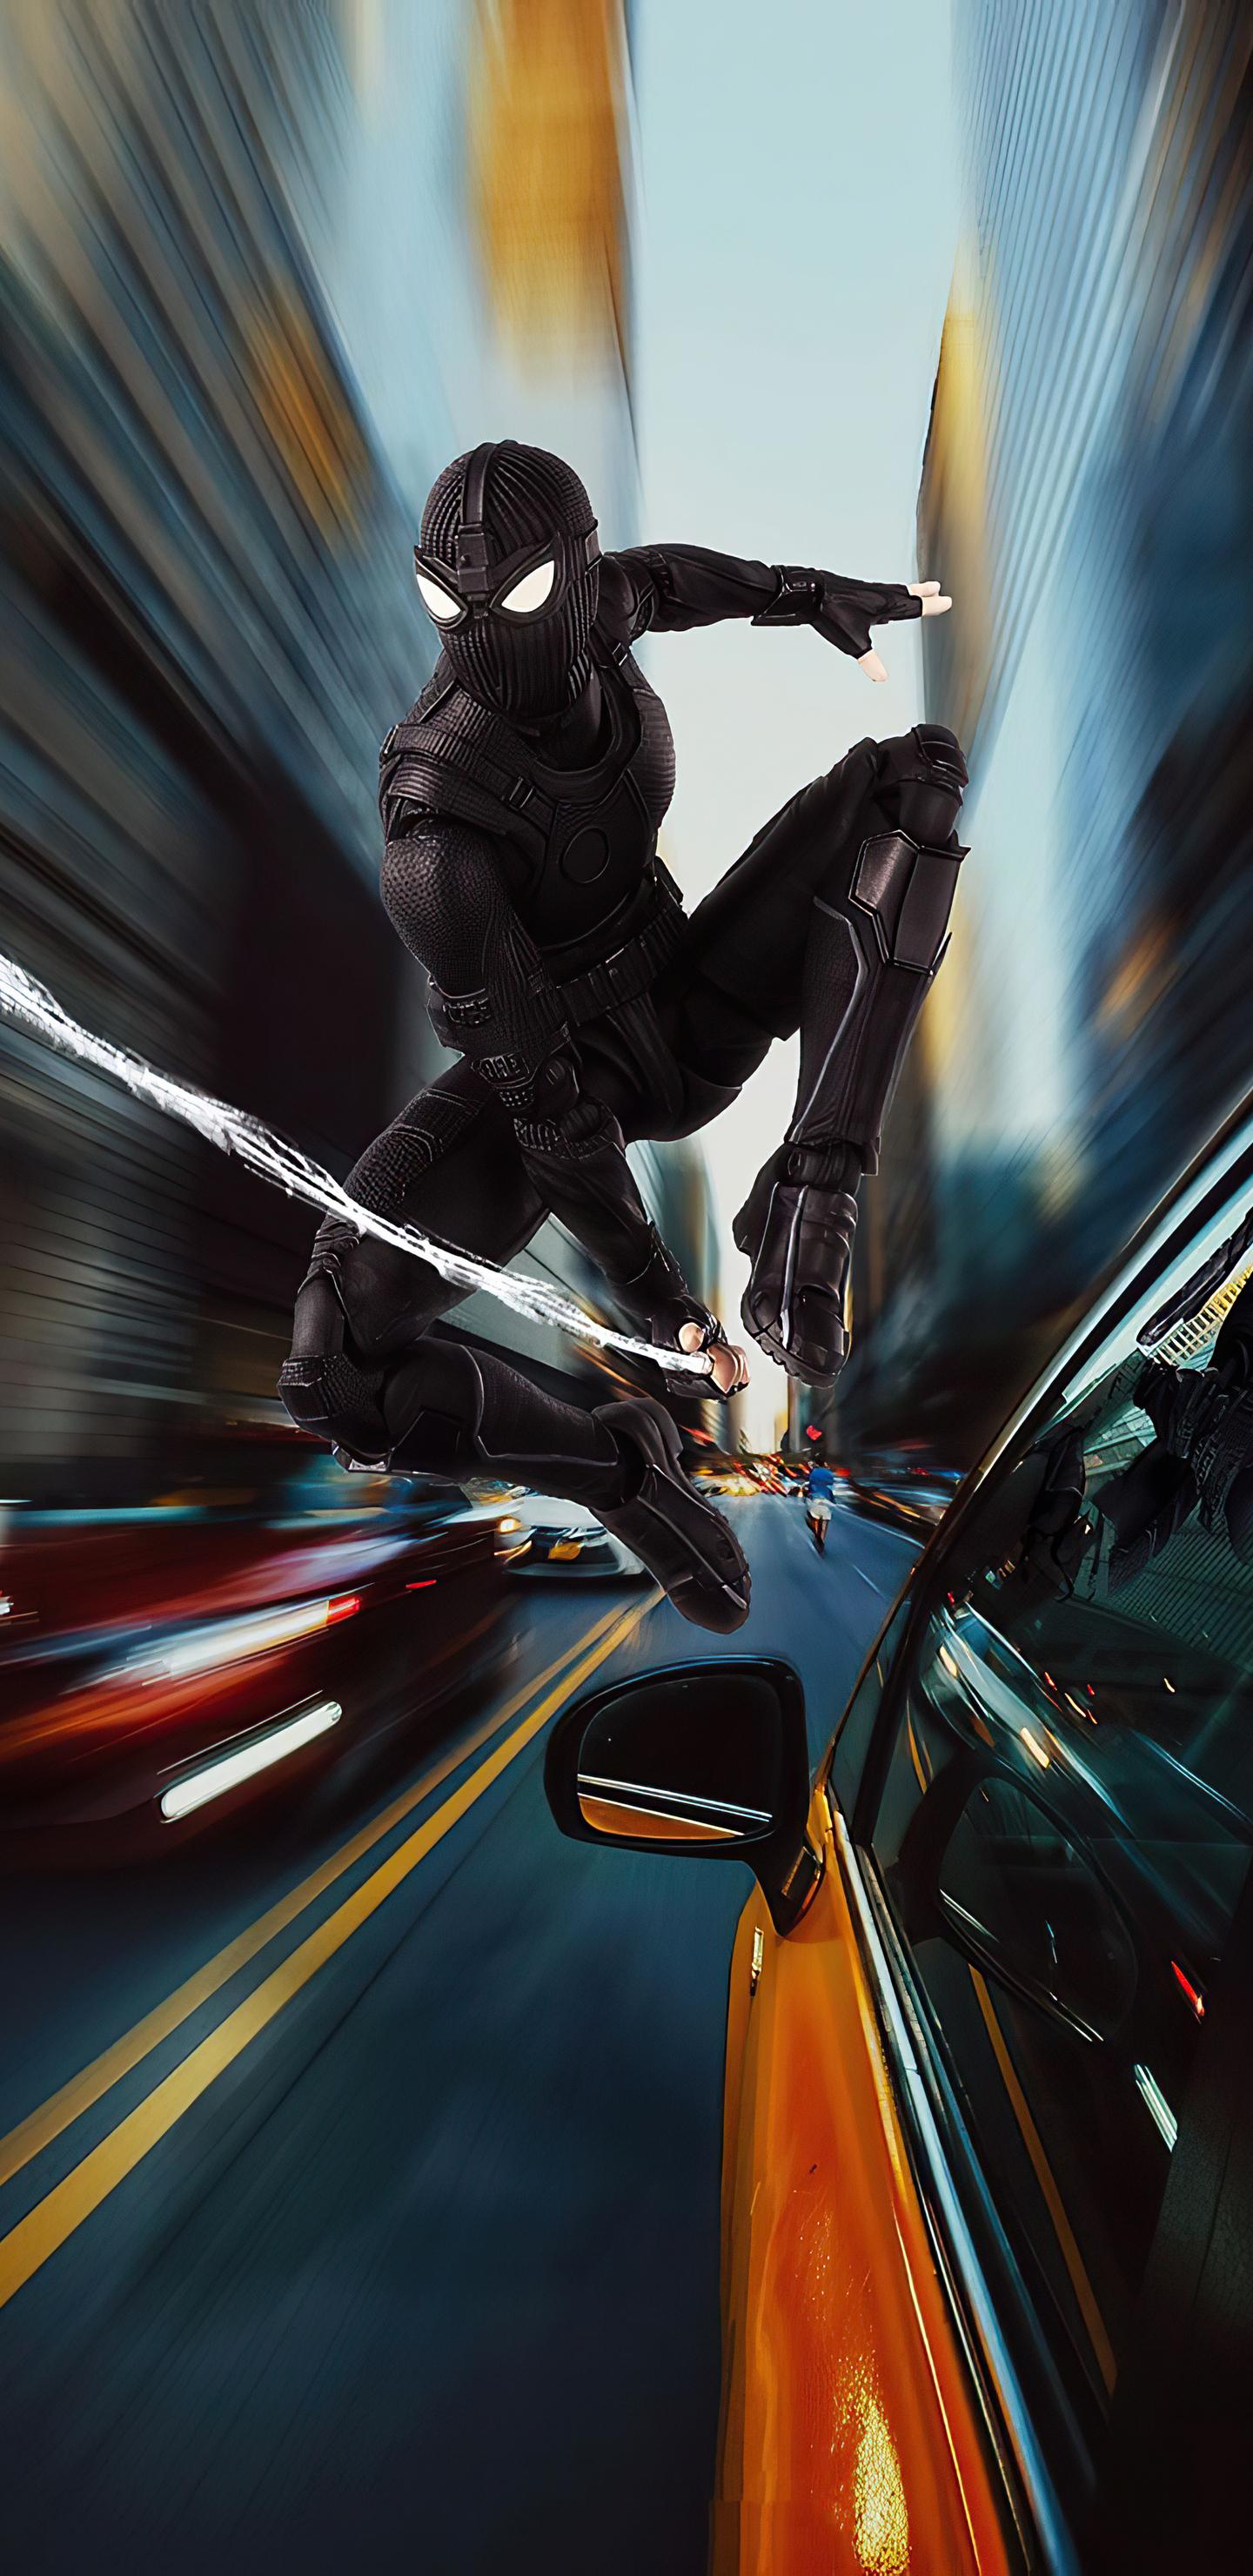 1440x2960 Spiderman Black Suit 2020 Samsung Galaxy Note 9 ...